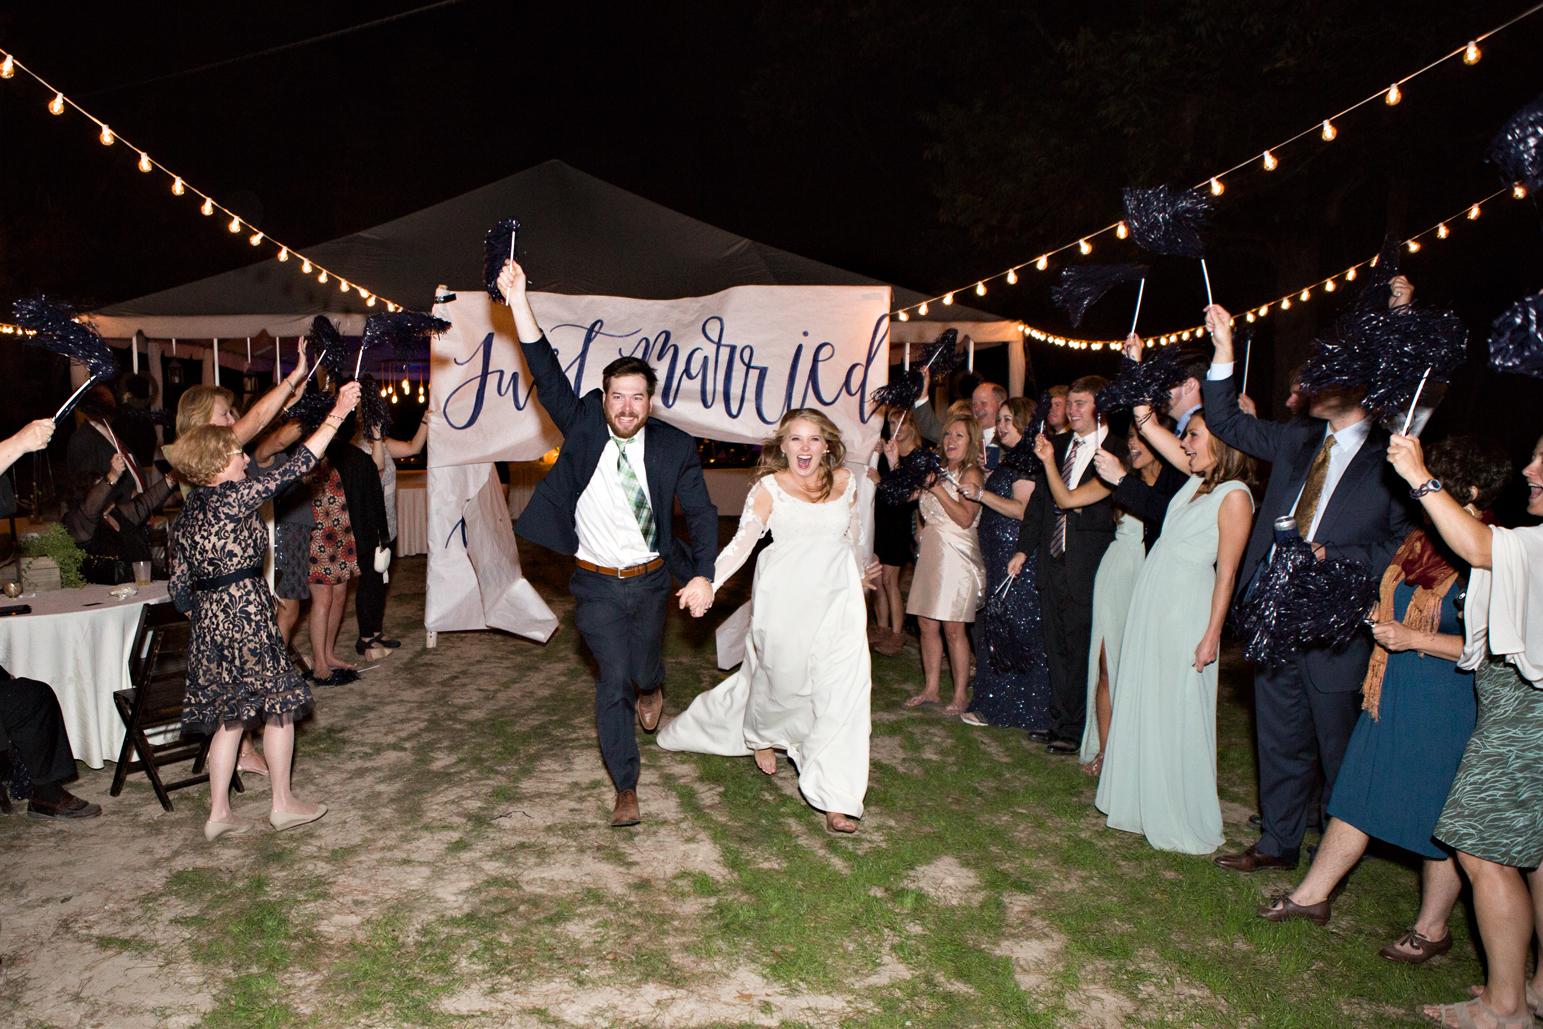 Alabama-Wedding-Photographers-Nick-Drollette-207.jpg